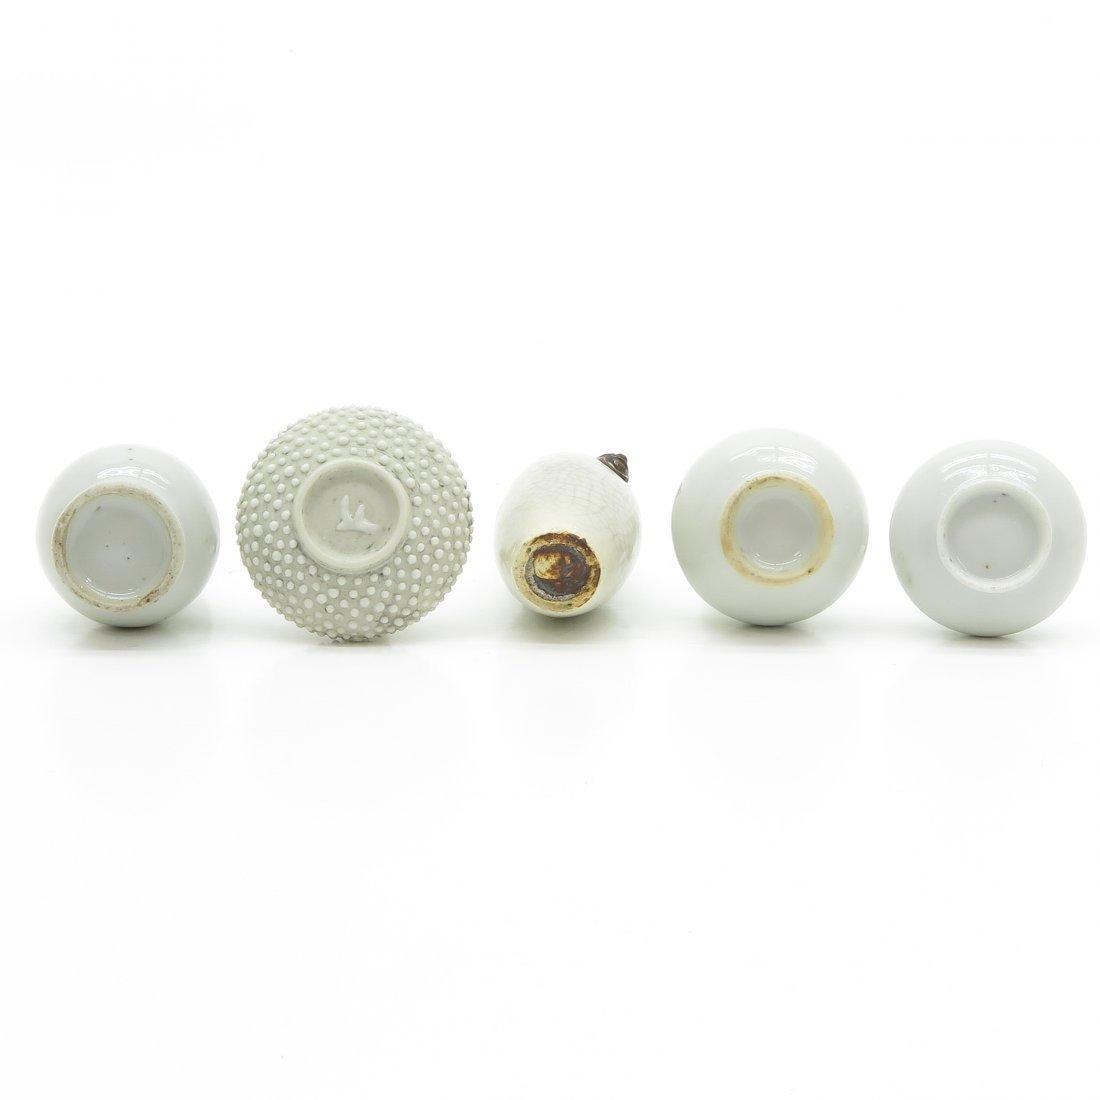 Lot of 5 China Porcelain Miniature Vases - 6